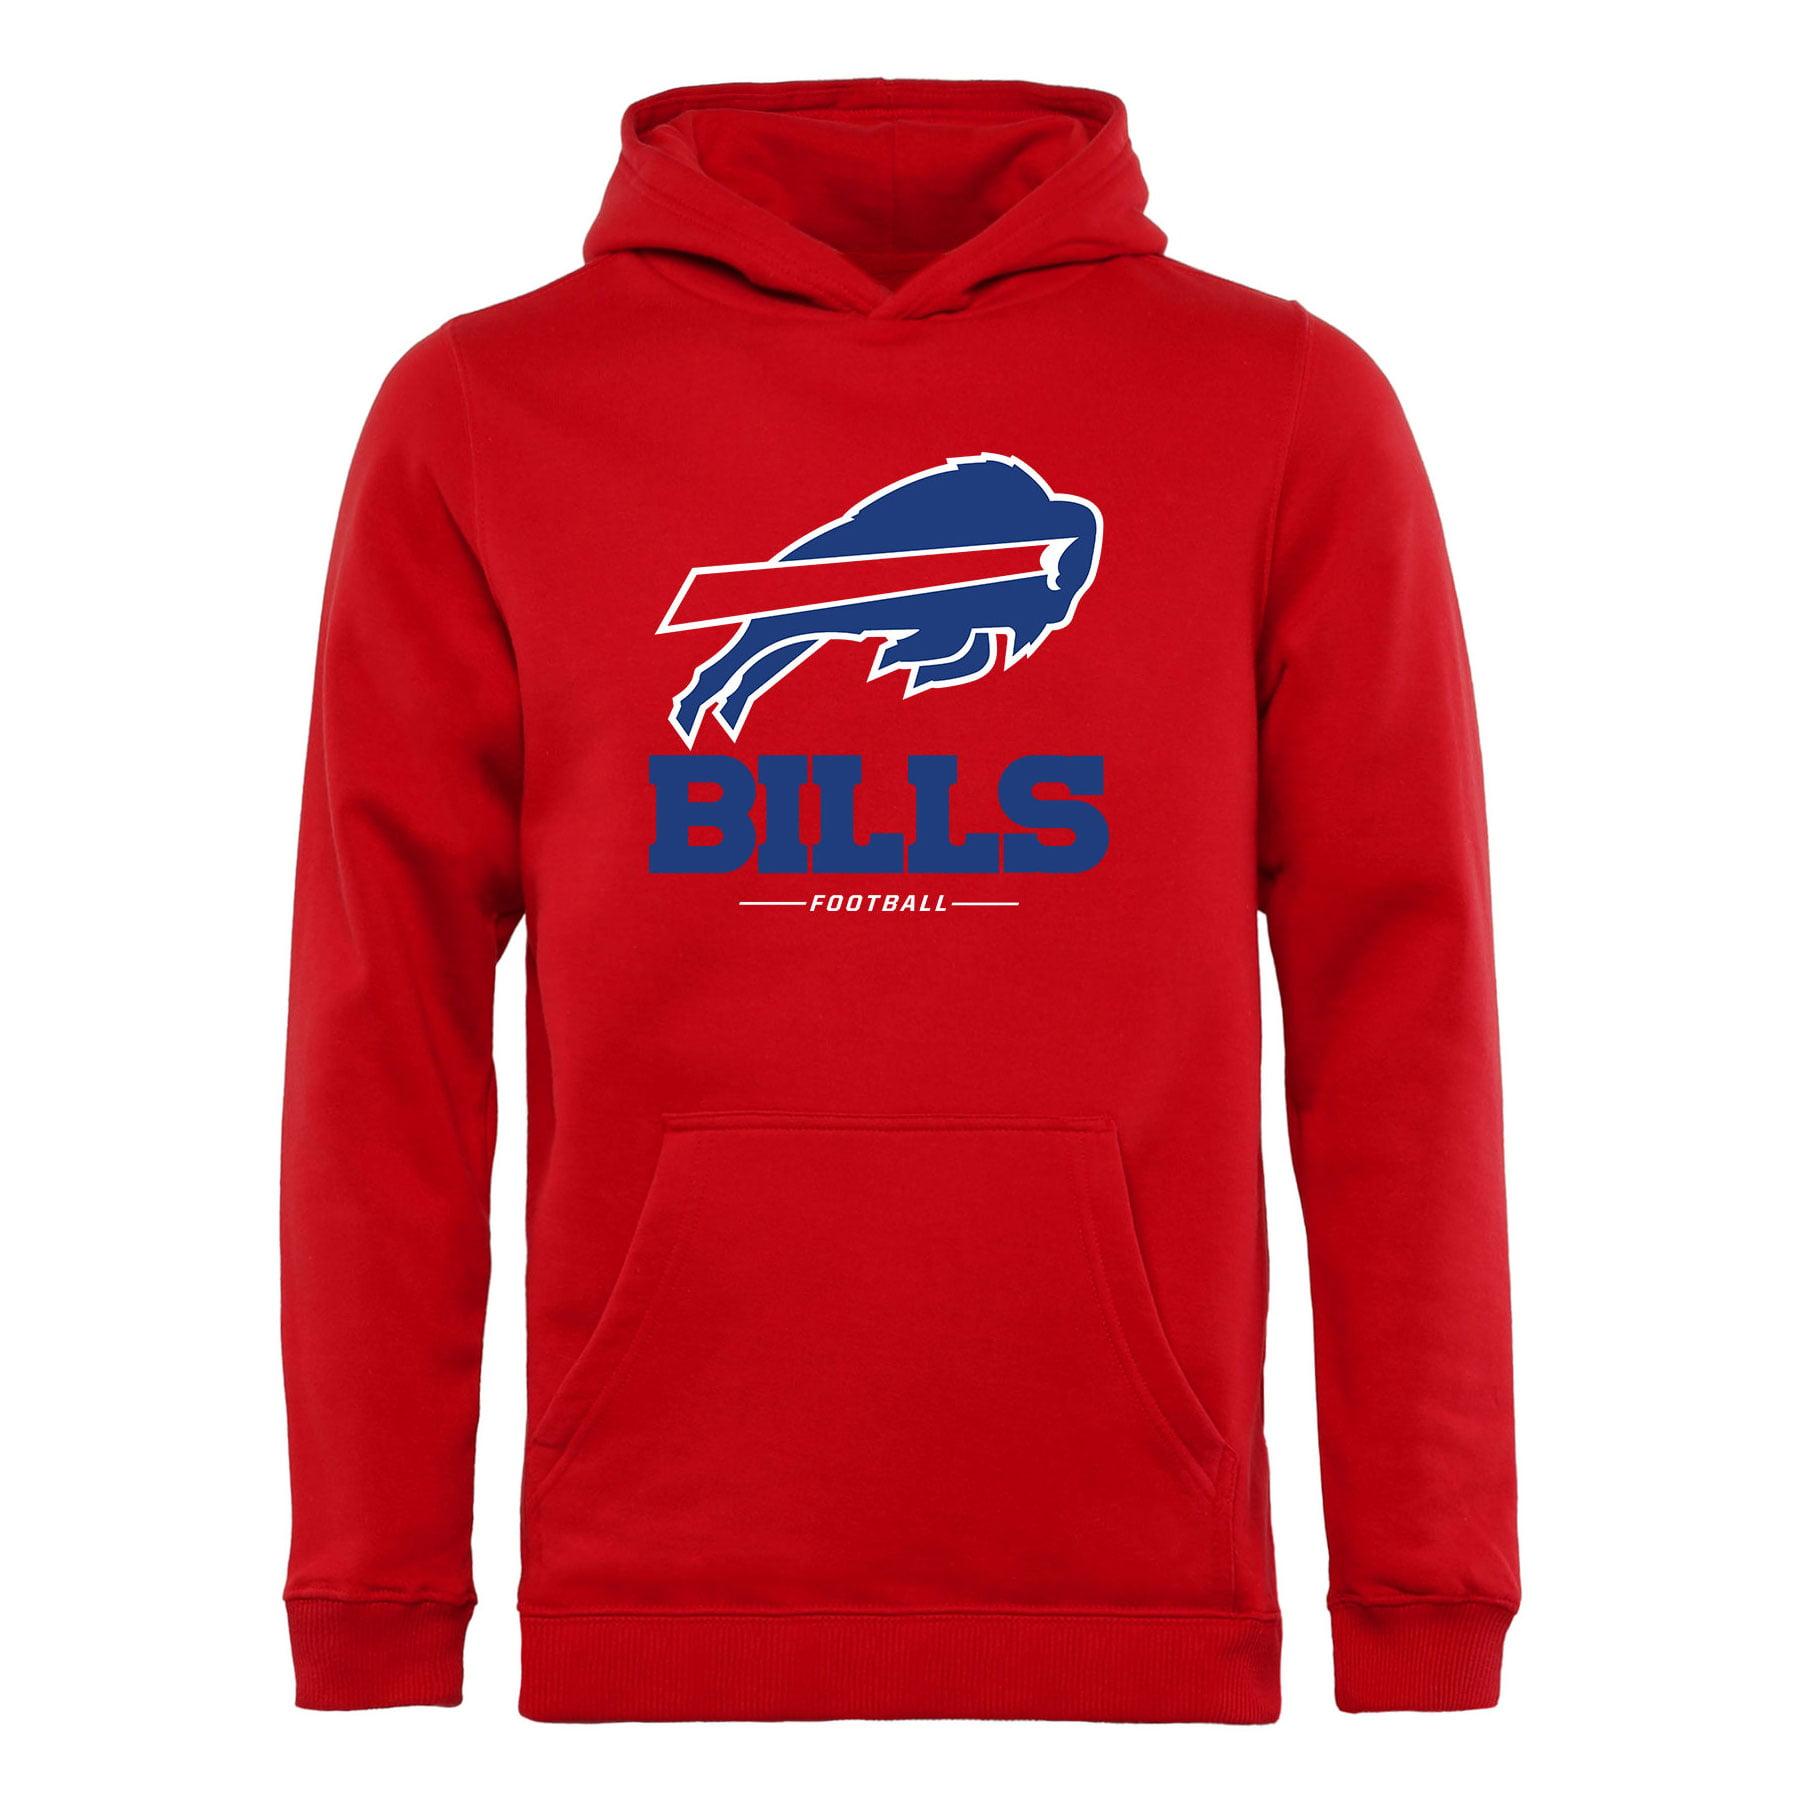 Buffalo Bills NFL Pro Line Youth Team Lockup Hoodie - Red